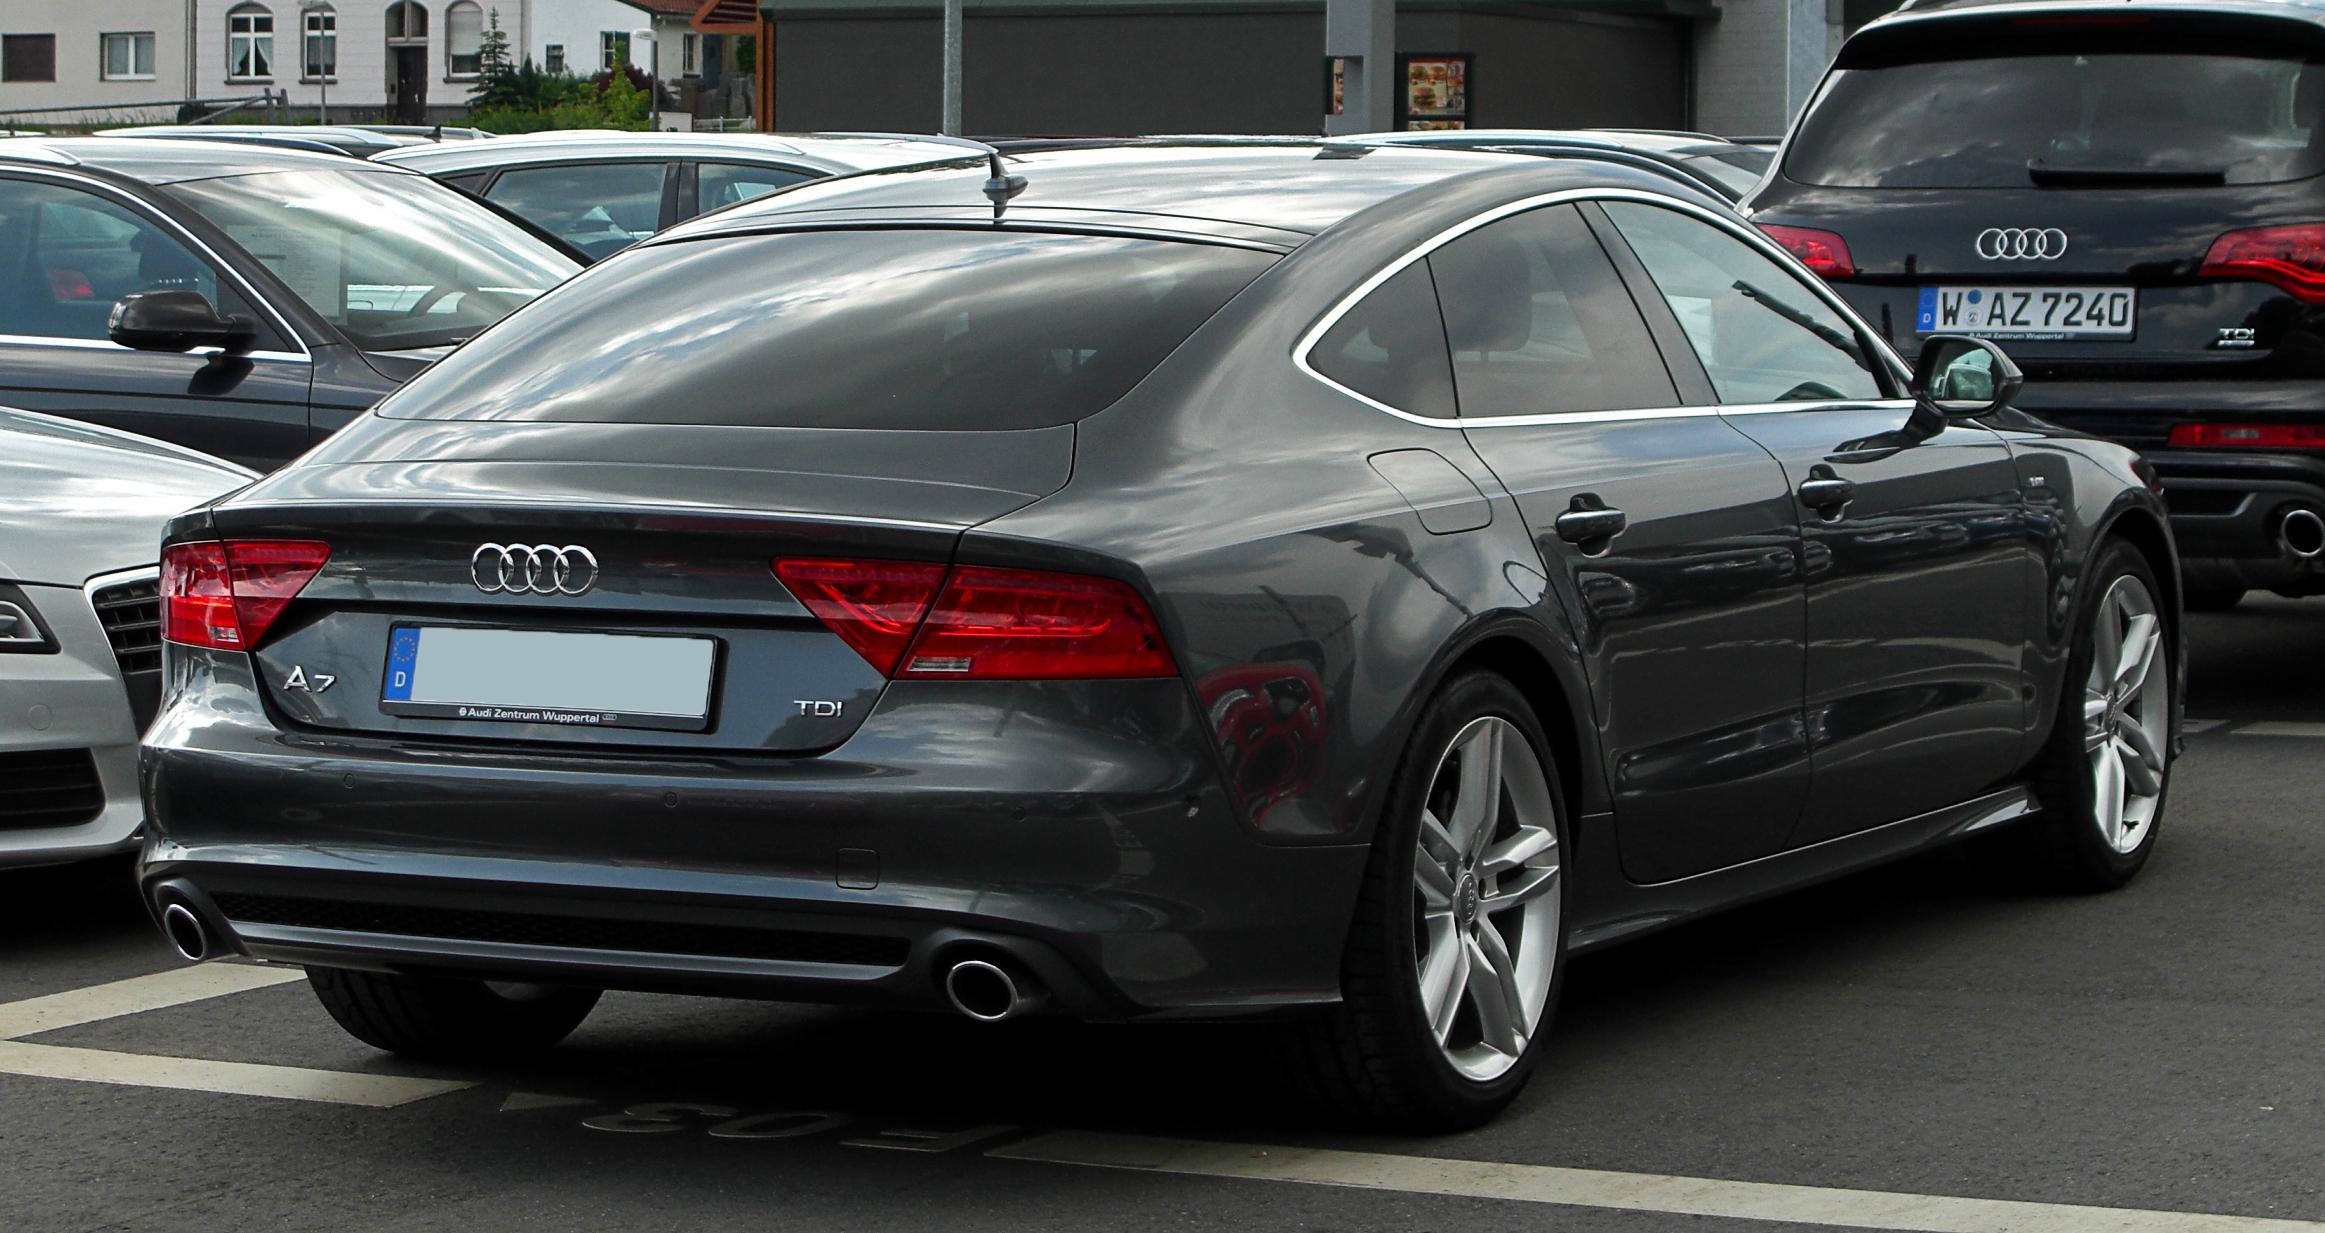 Audi A7 2014 Black Coupe